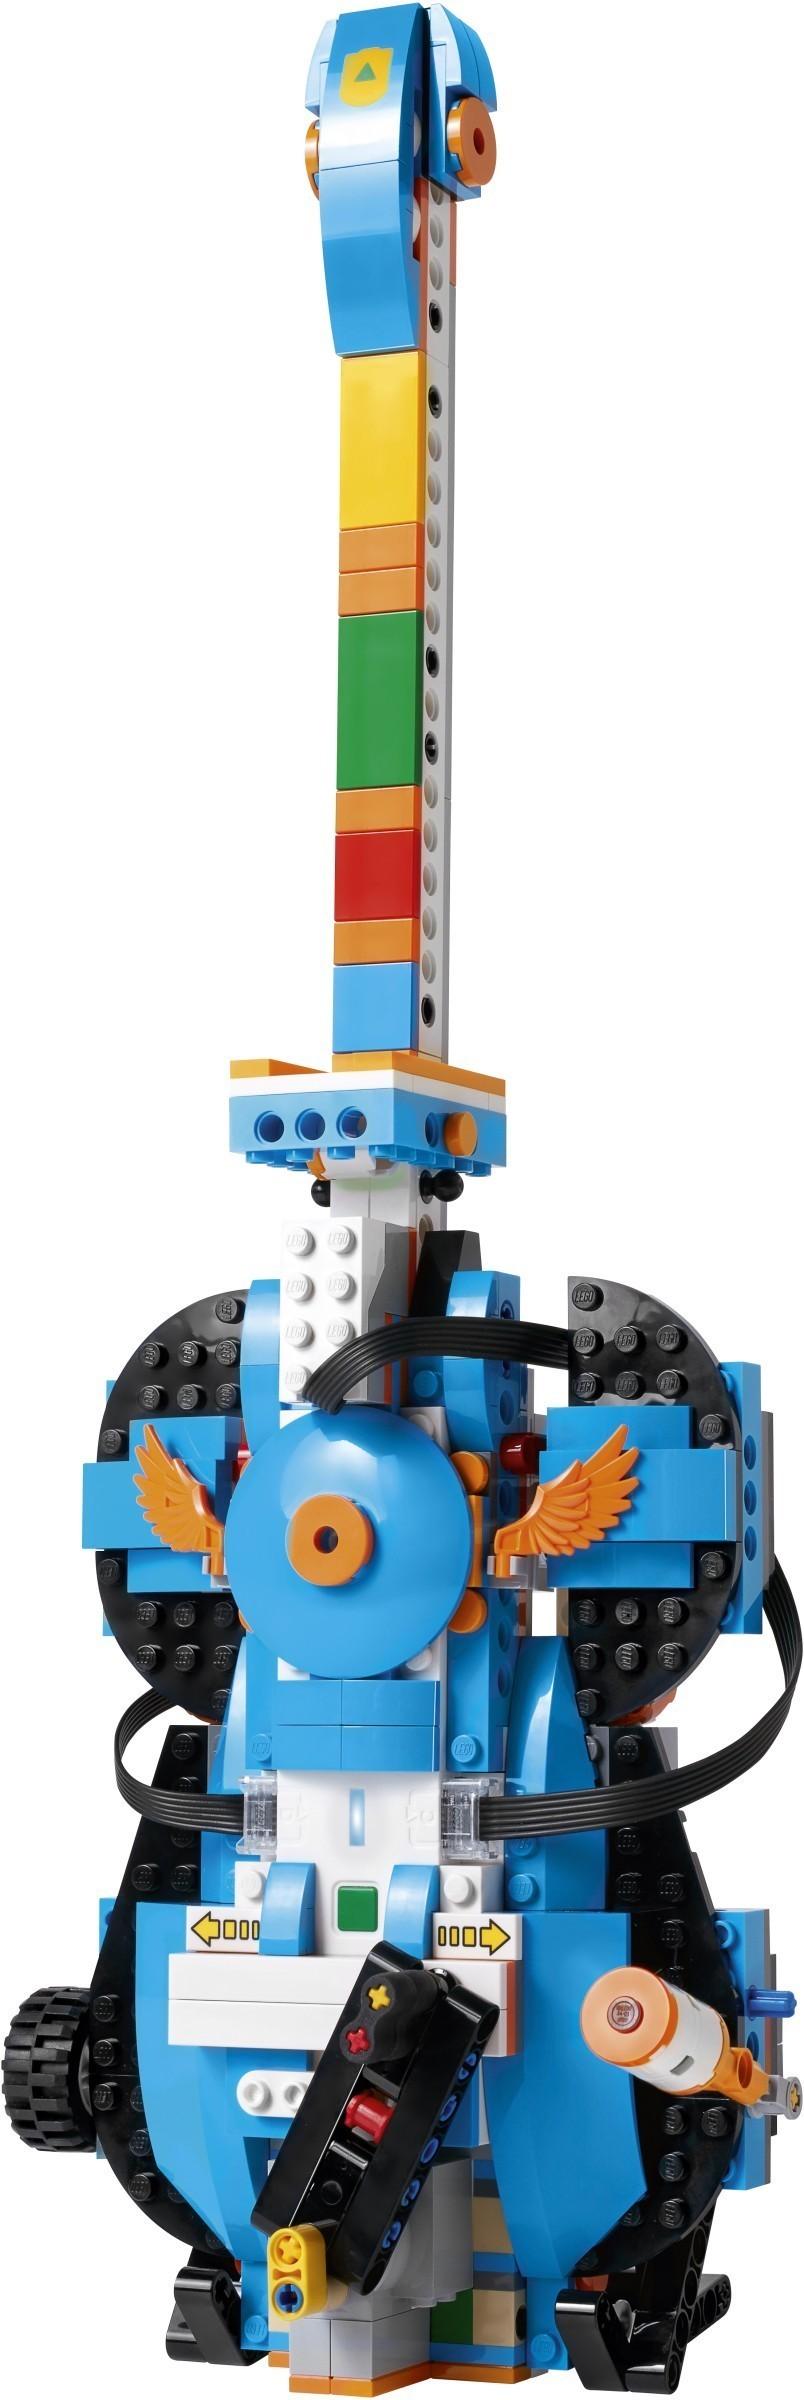 LEGO Boost Gitara 4000